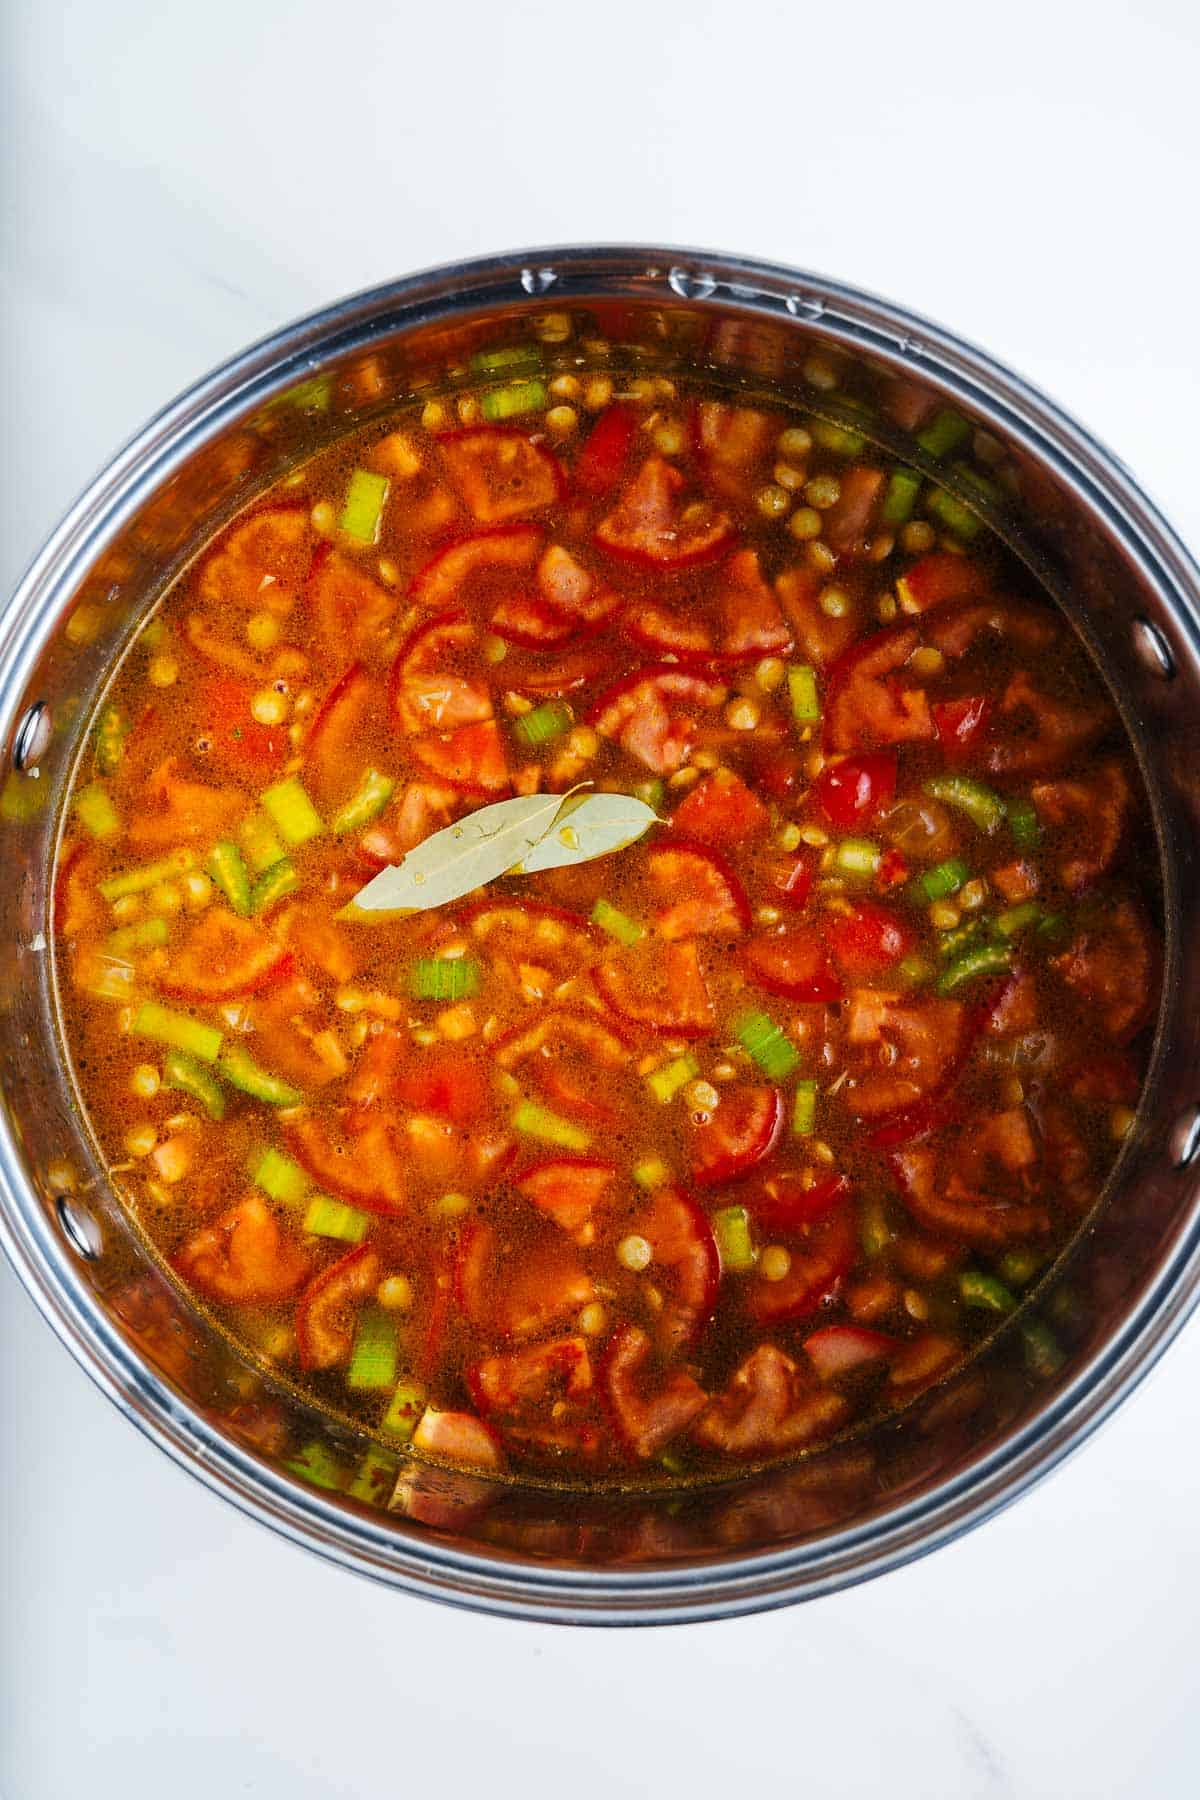 Simmering Sopa de Lentejas